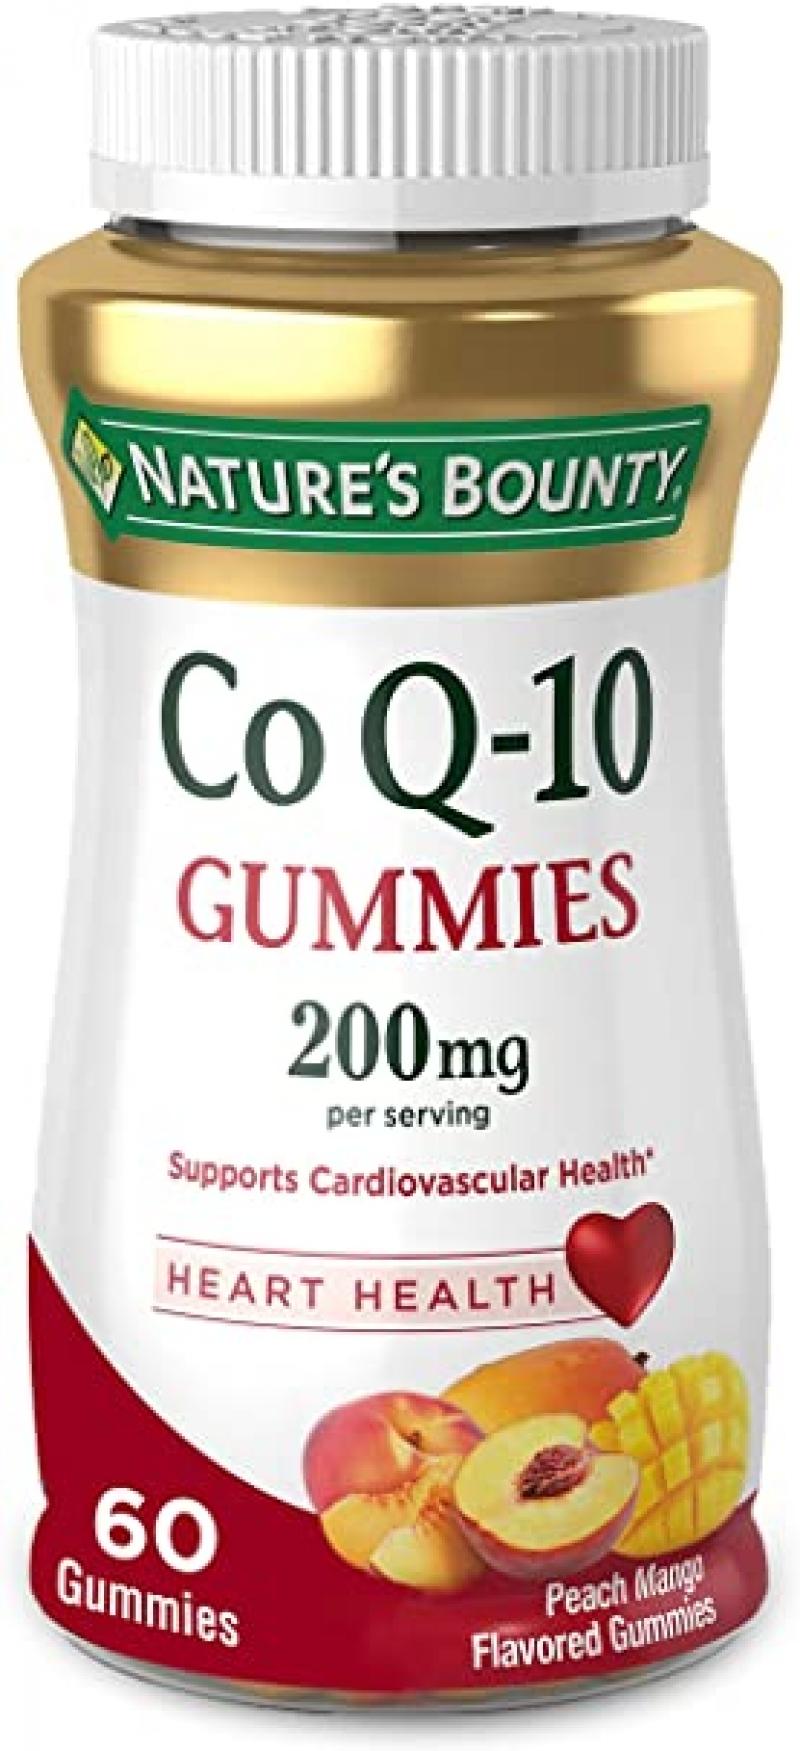 ihocon: Nature's Bounty CoQ10 Gummies 200mg 60 Count